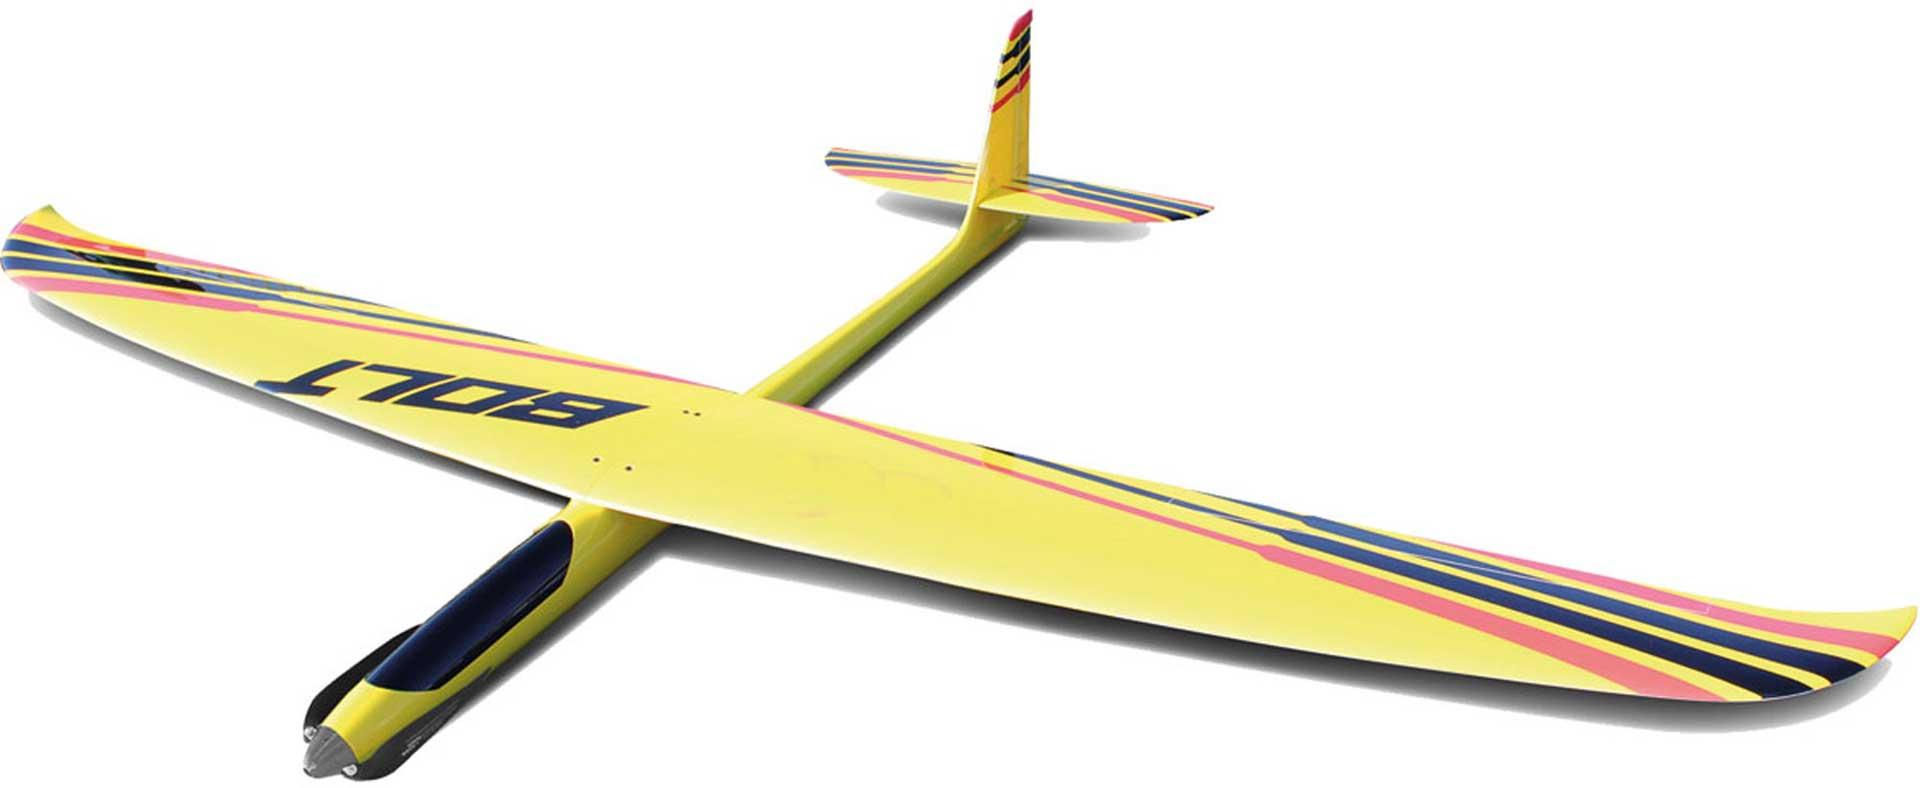 Robbe Modellsport Bolt 2,0 m ARF Voll GFK